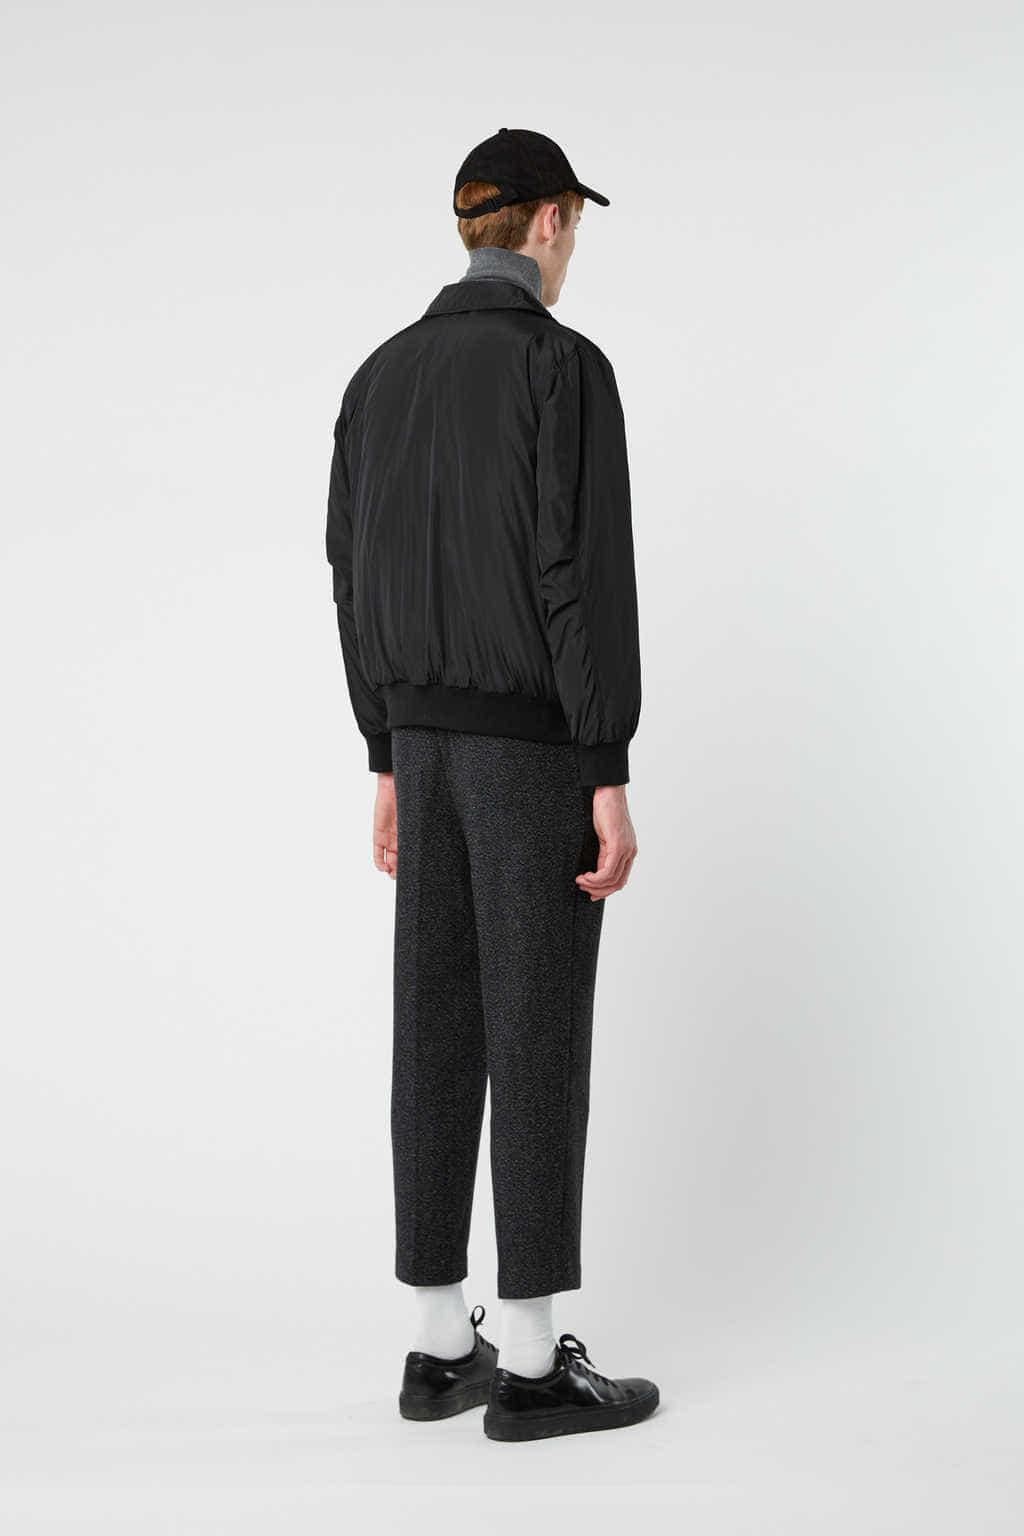 Jacket 2657 Black 14